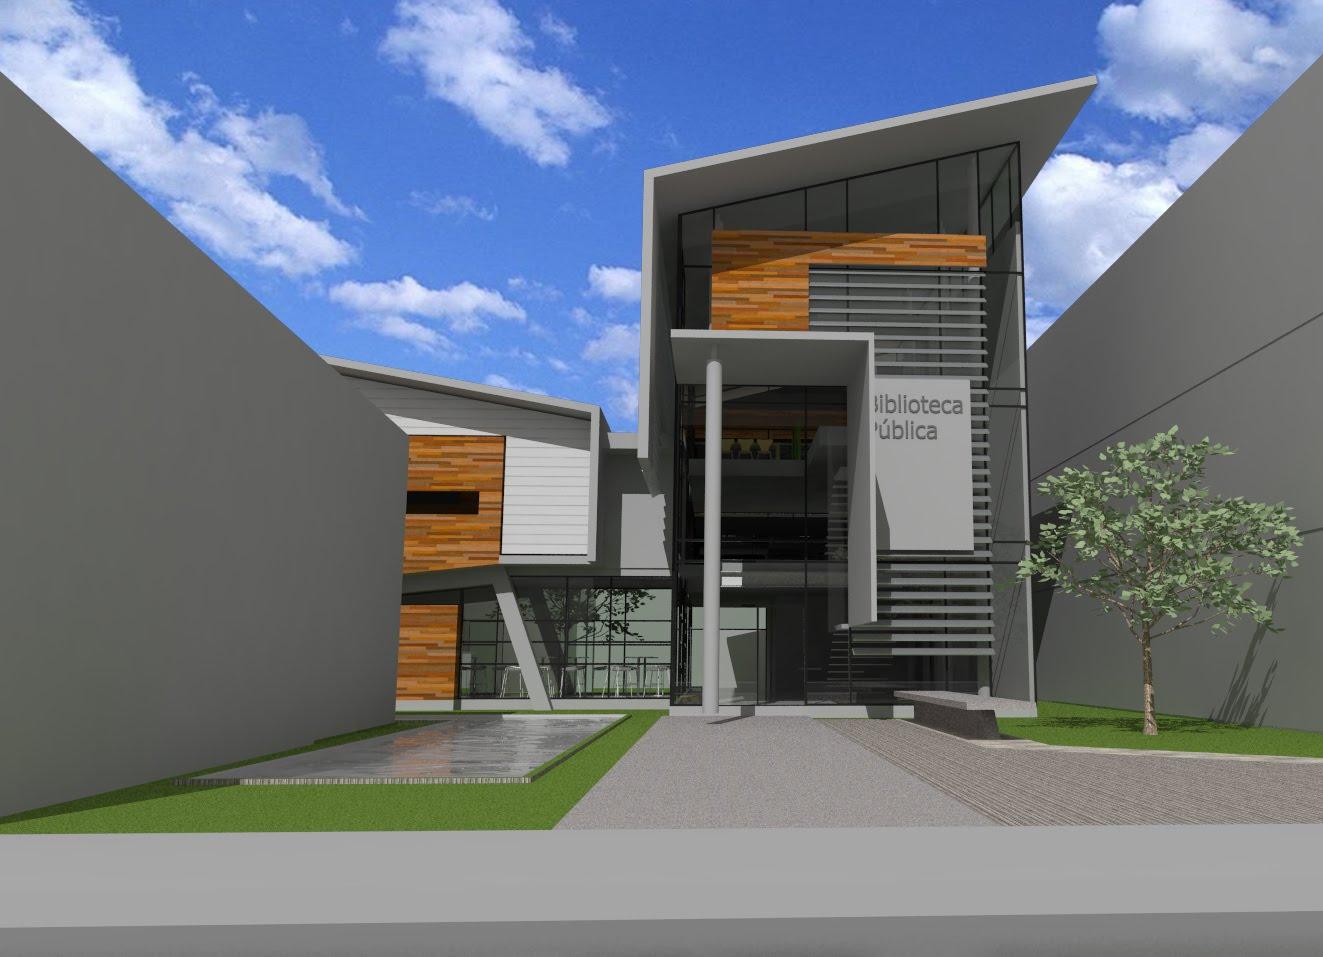 Arquitectura carlos vega taller de arquitectura tropical for En que universidades hay arquitectura